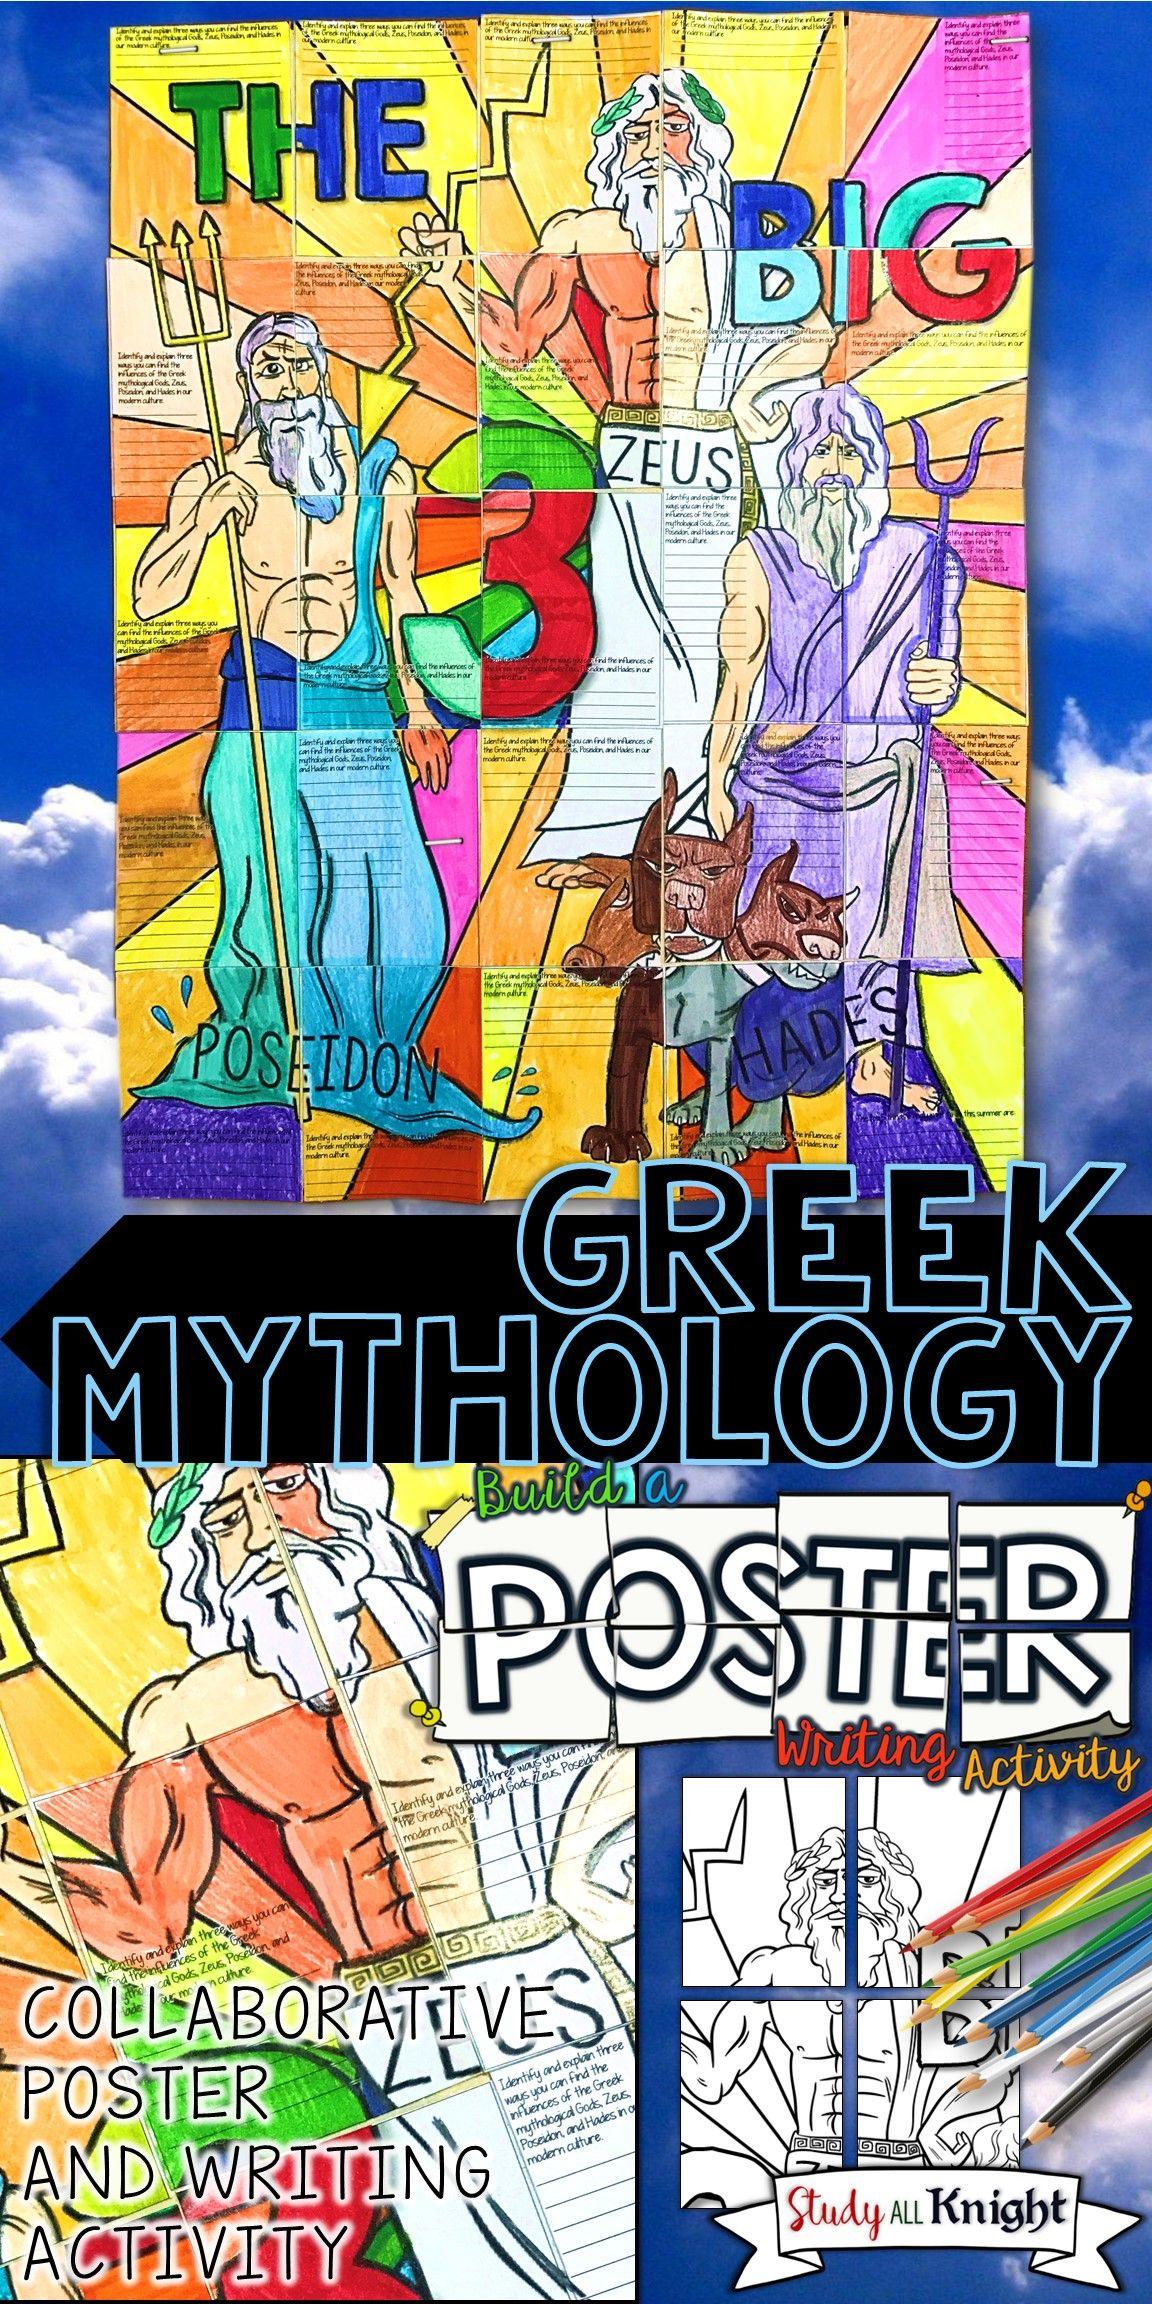 Greek Mythology Collaborative Poster With Greek Gods